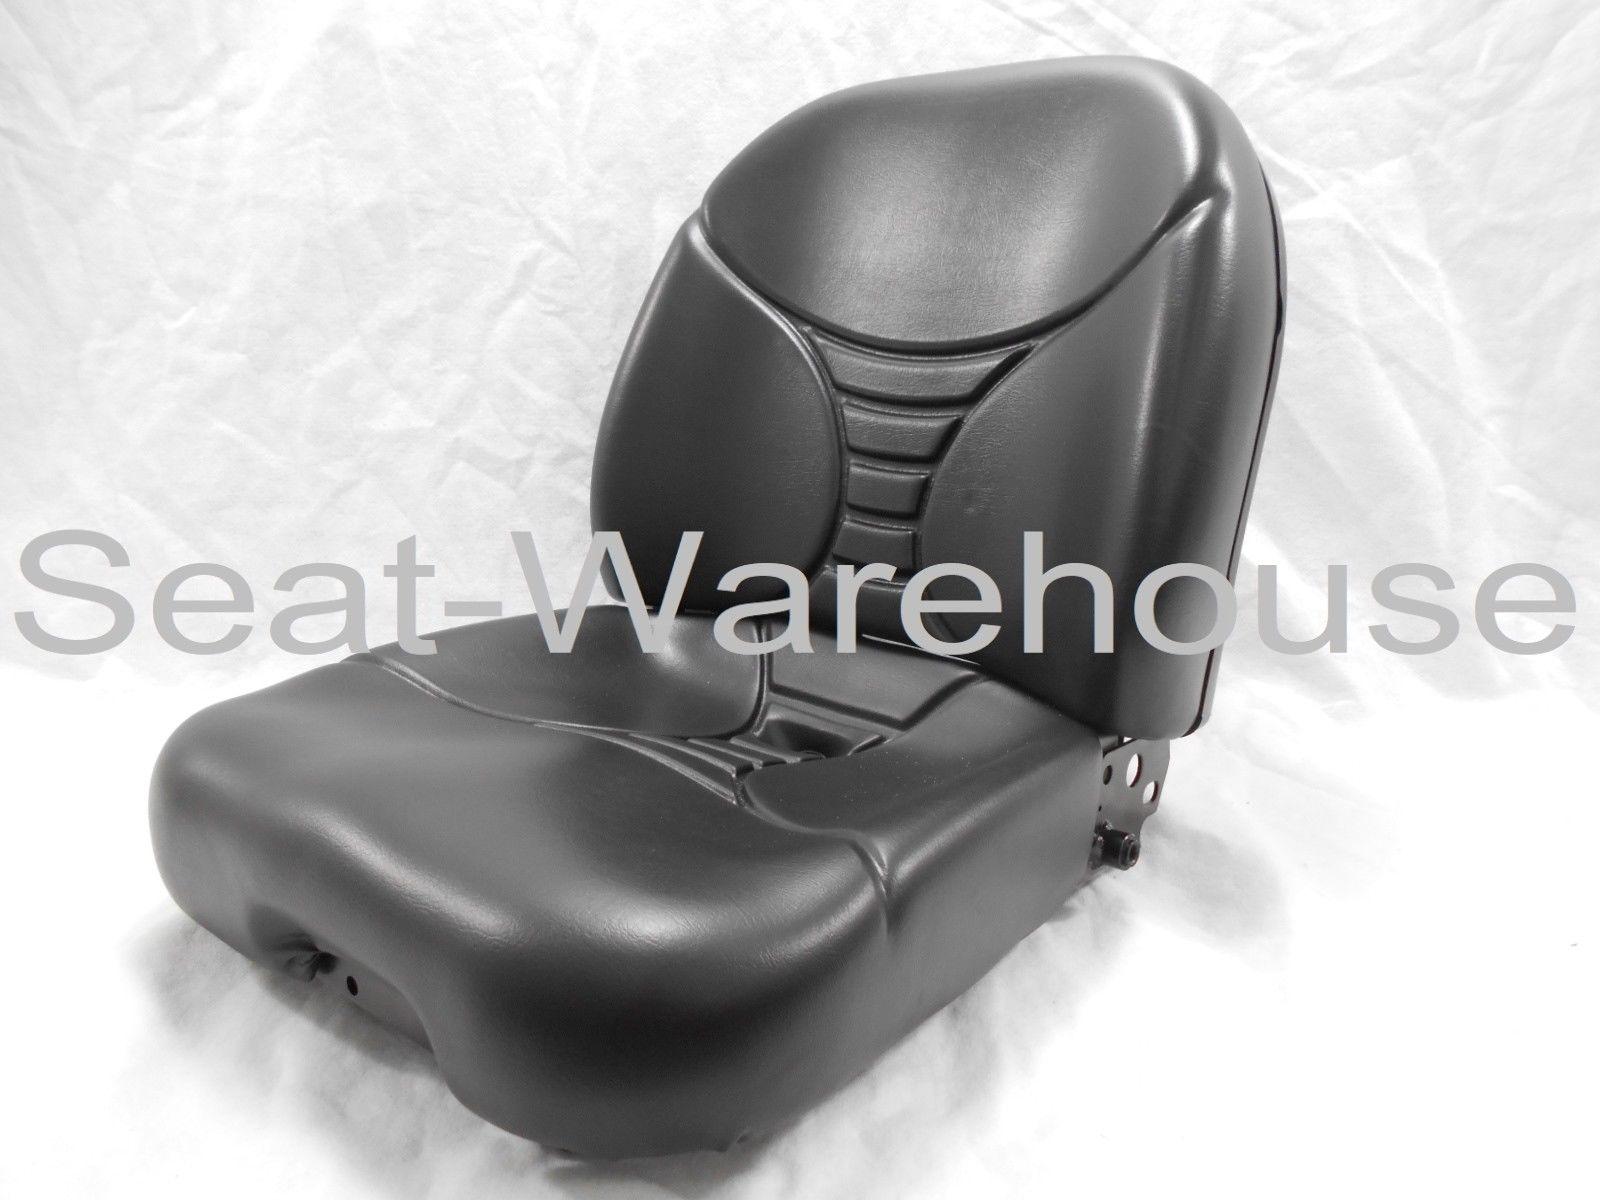 BLACK REPLACEMENT SEAT FITS KUBOTA BACKHOE B26, L39, L45, L47, M59, M62 #QU2